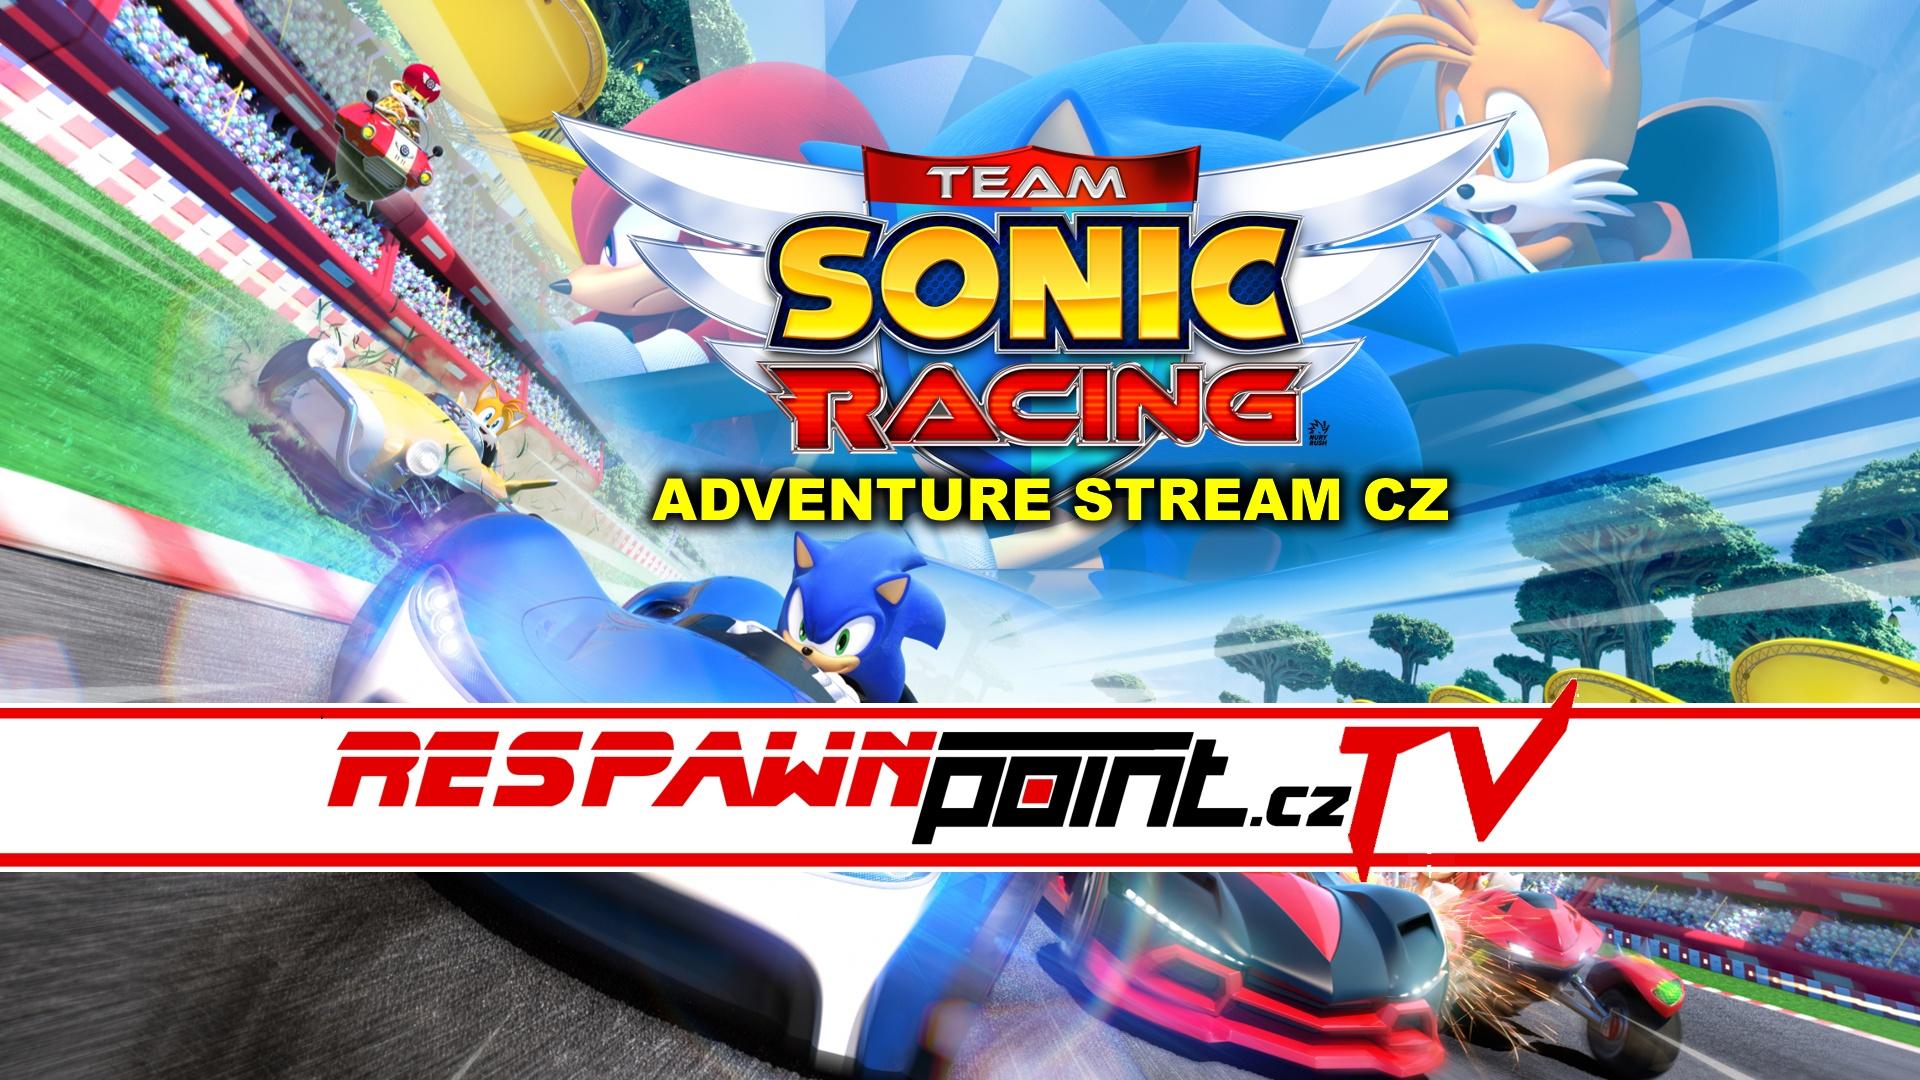 Team Sonic Racing – Adventure Stream CZ